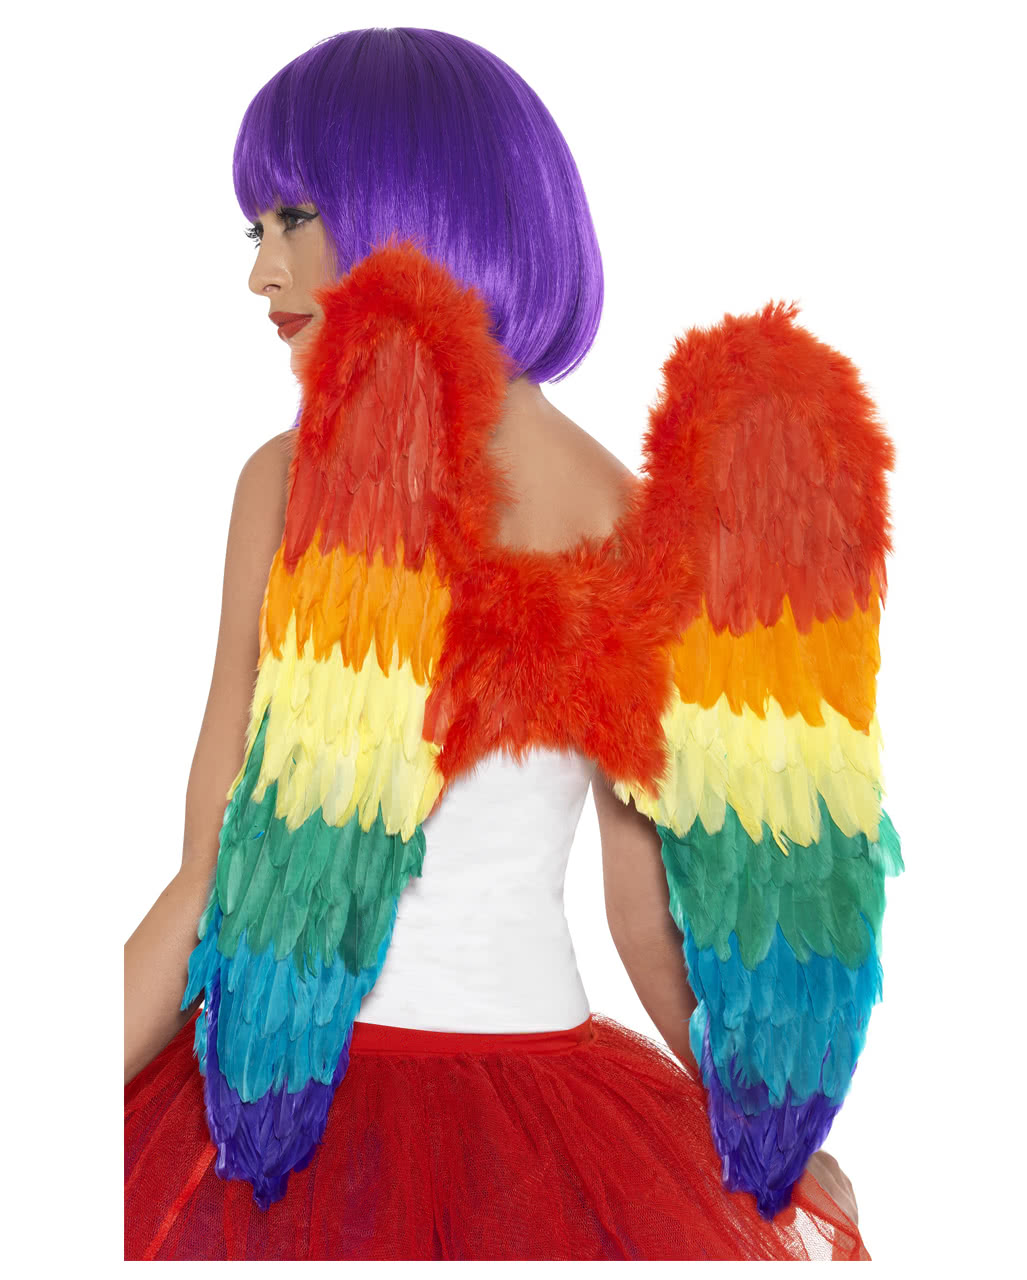 Große Rainbow Flügel als Kostümzubehör | Karneval Universe